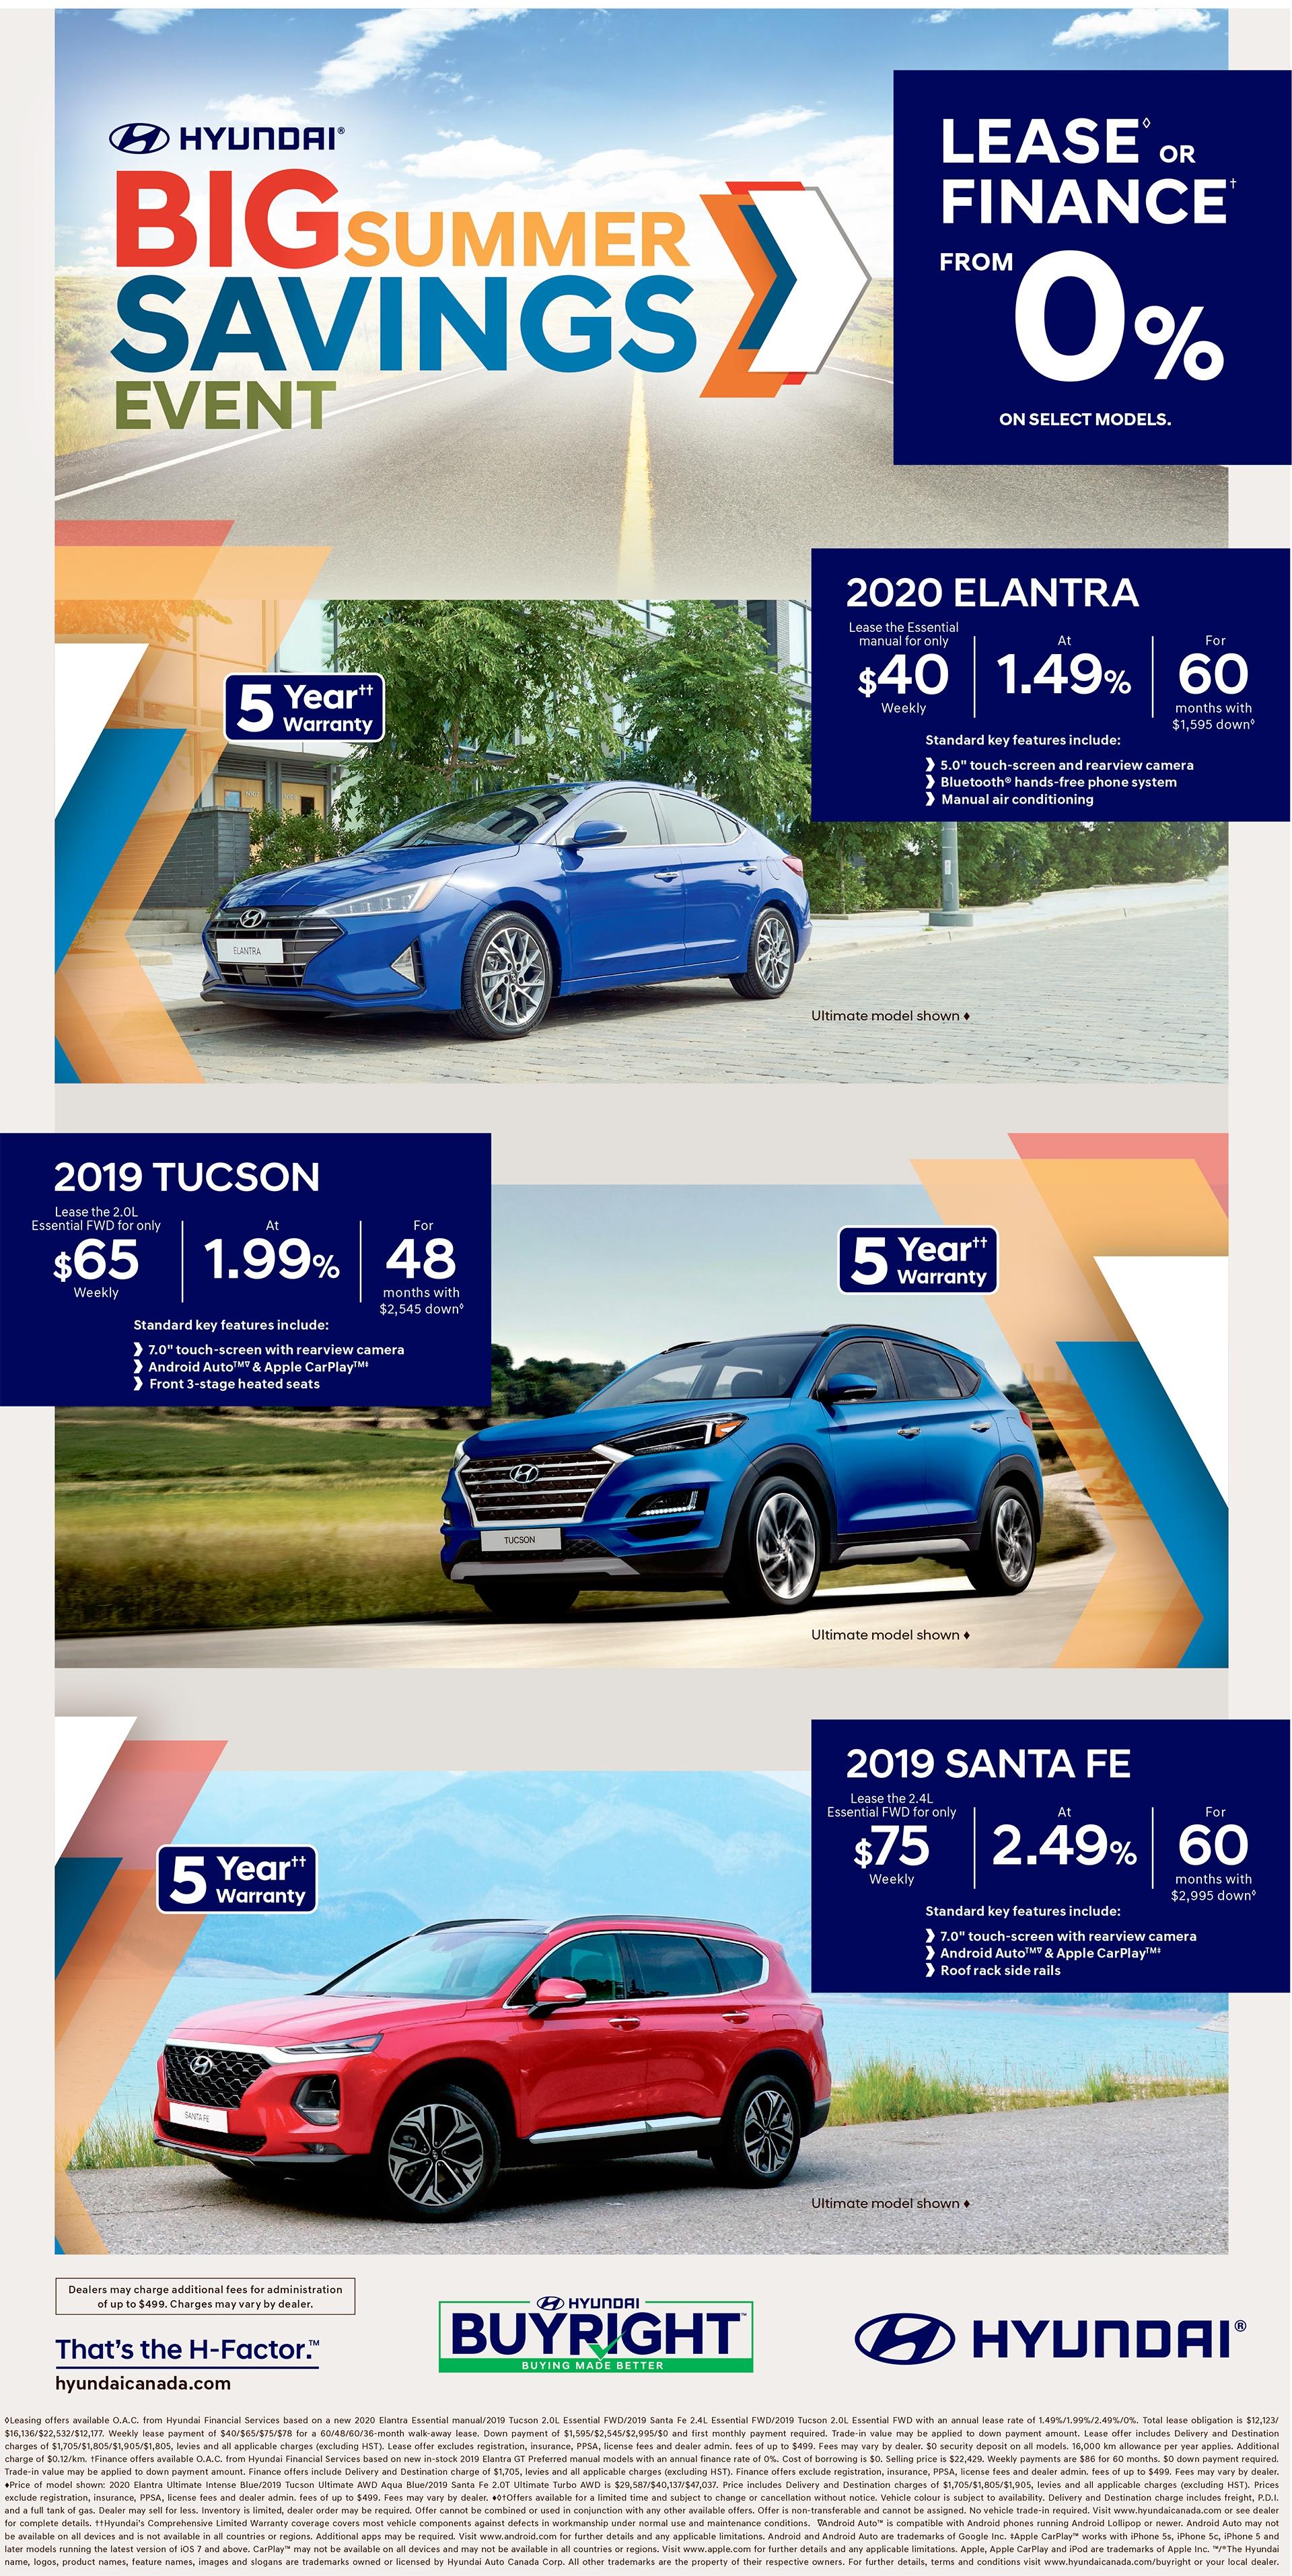 Hyundai-Big-Saving-Event-promo